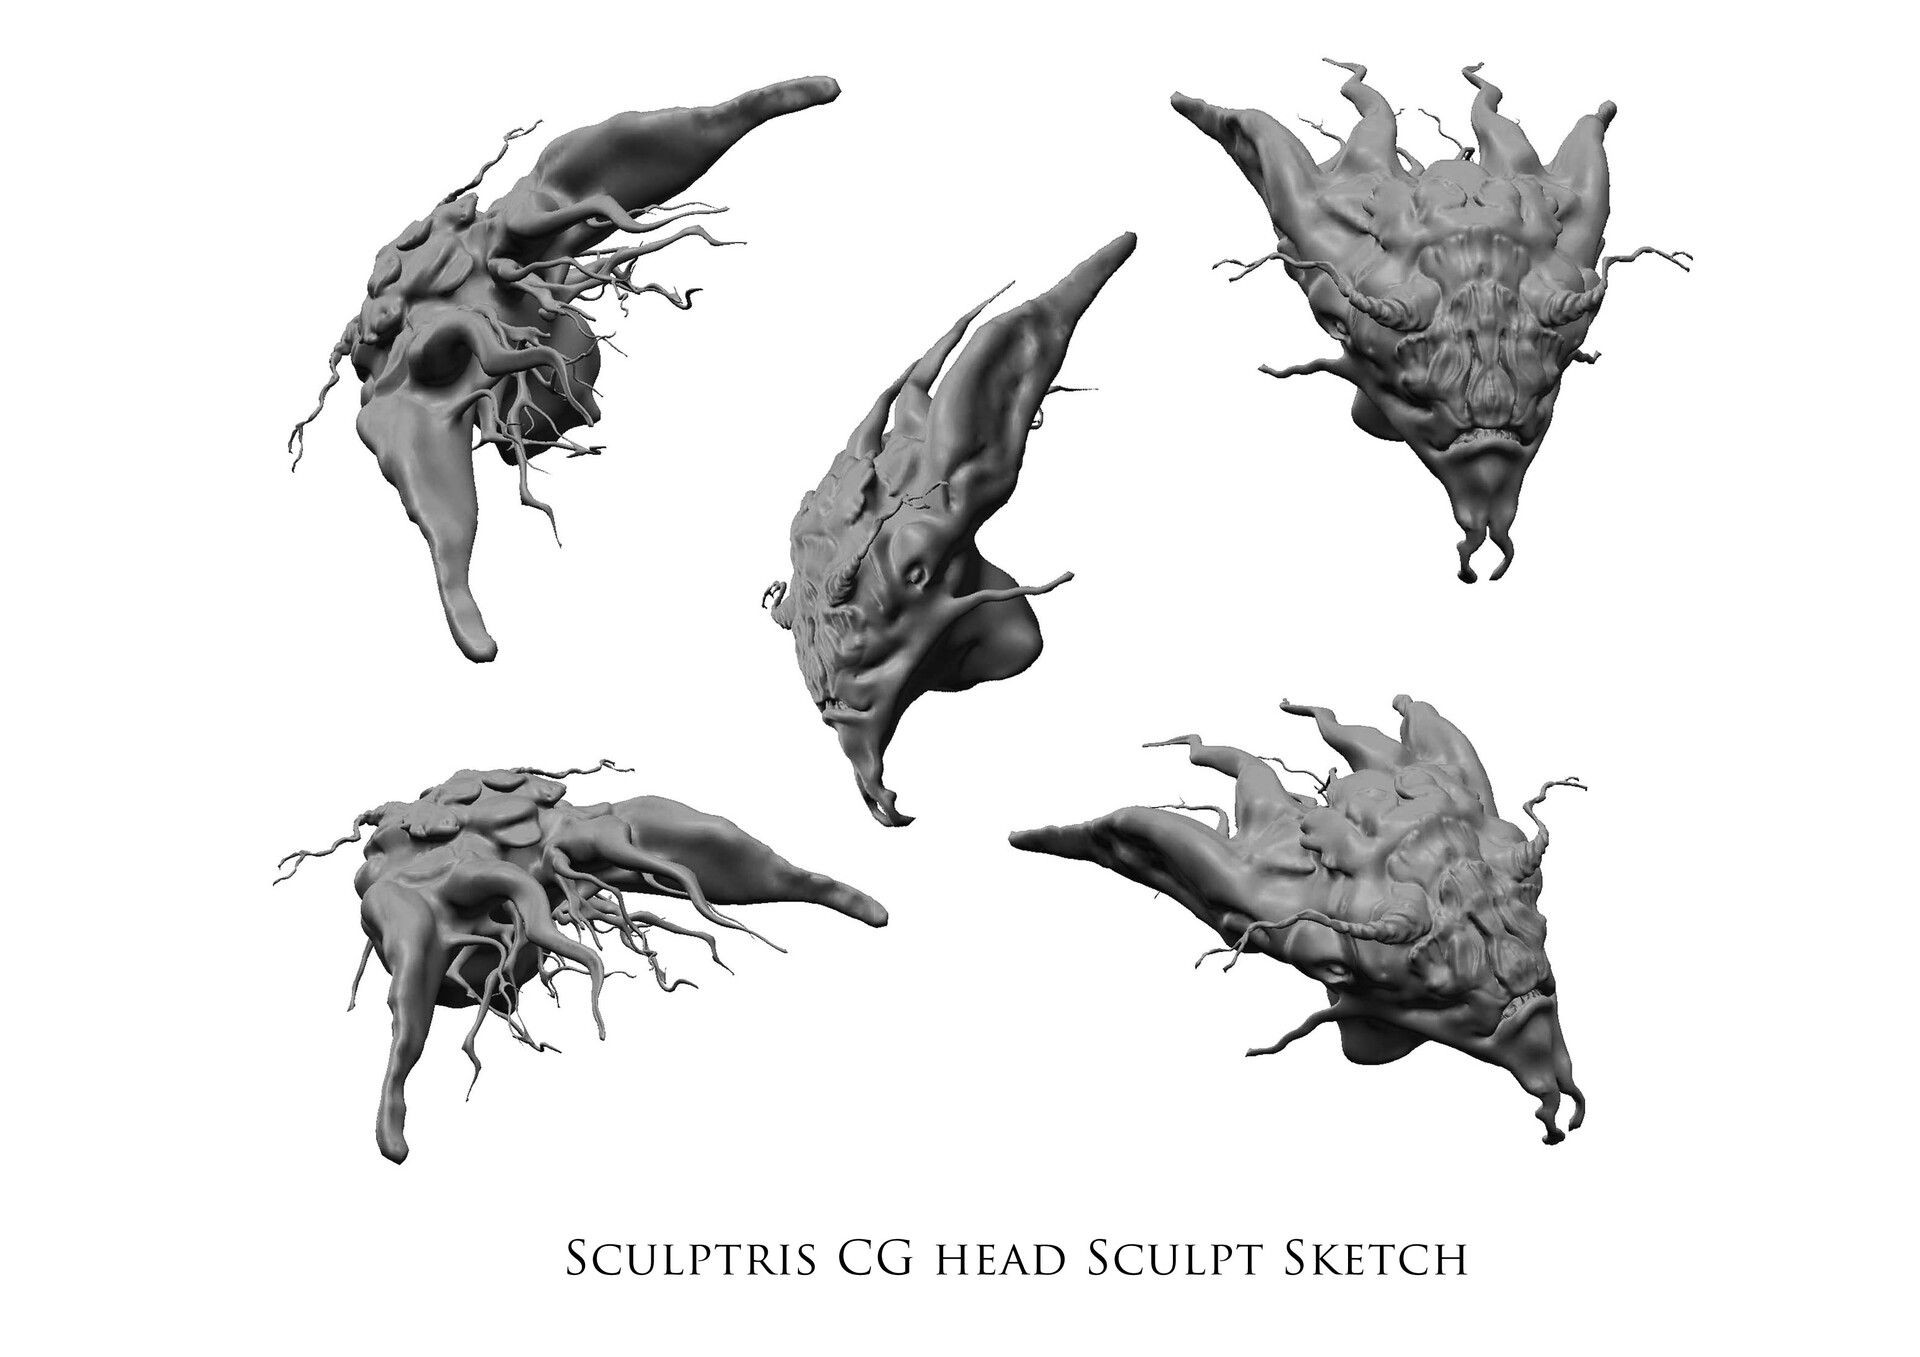 Sculptris sketch